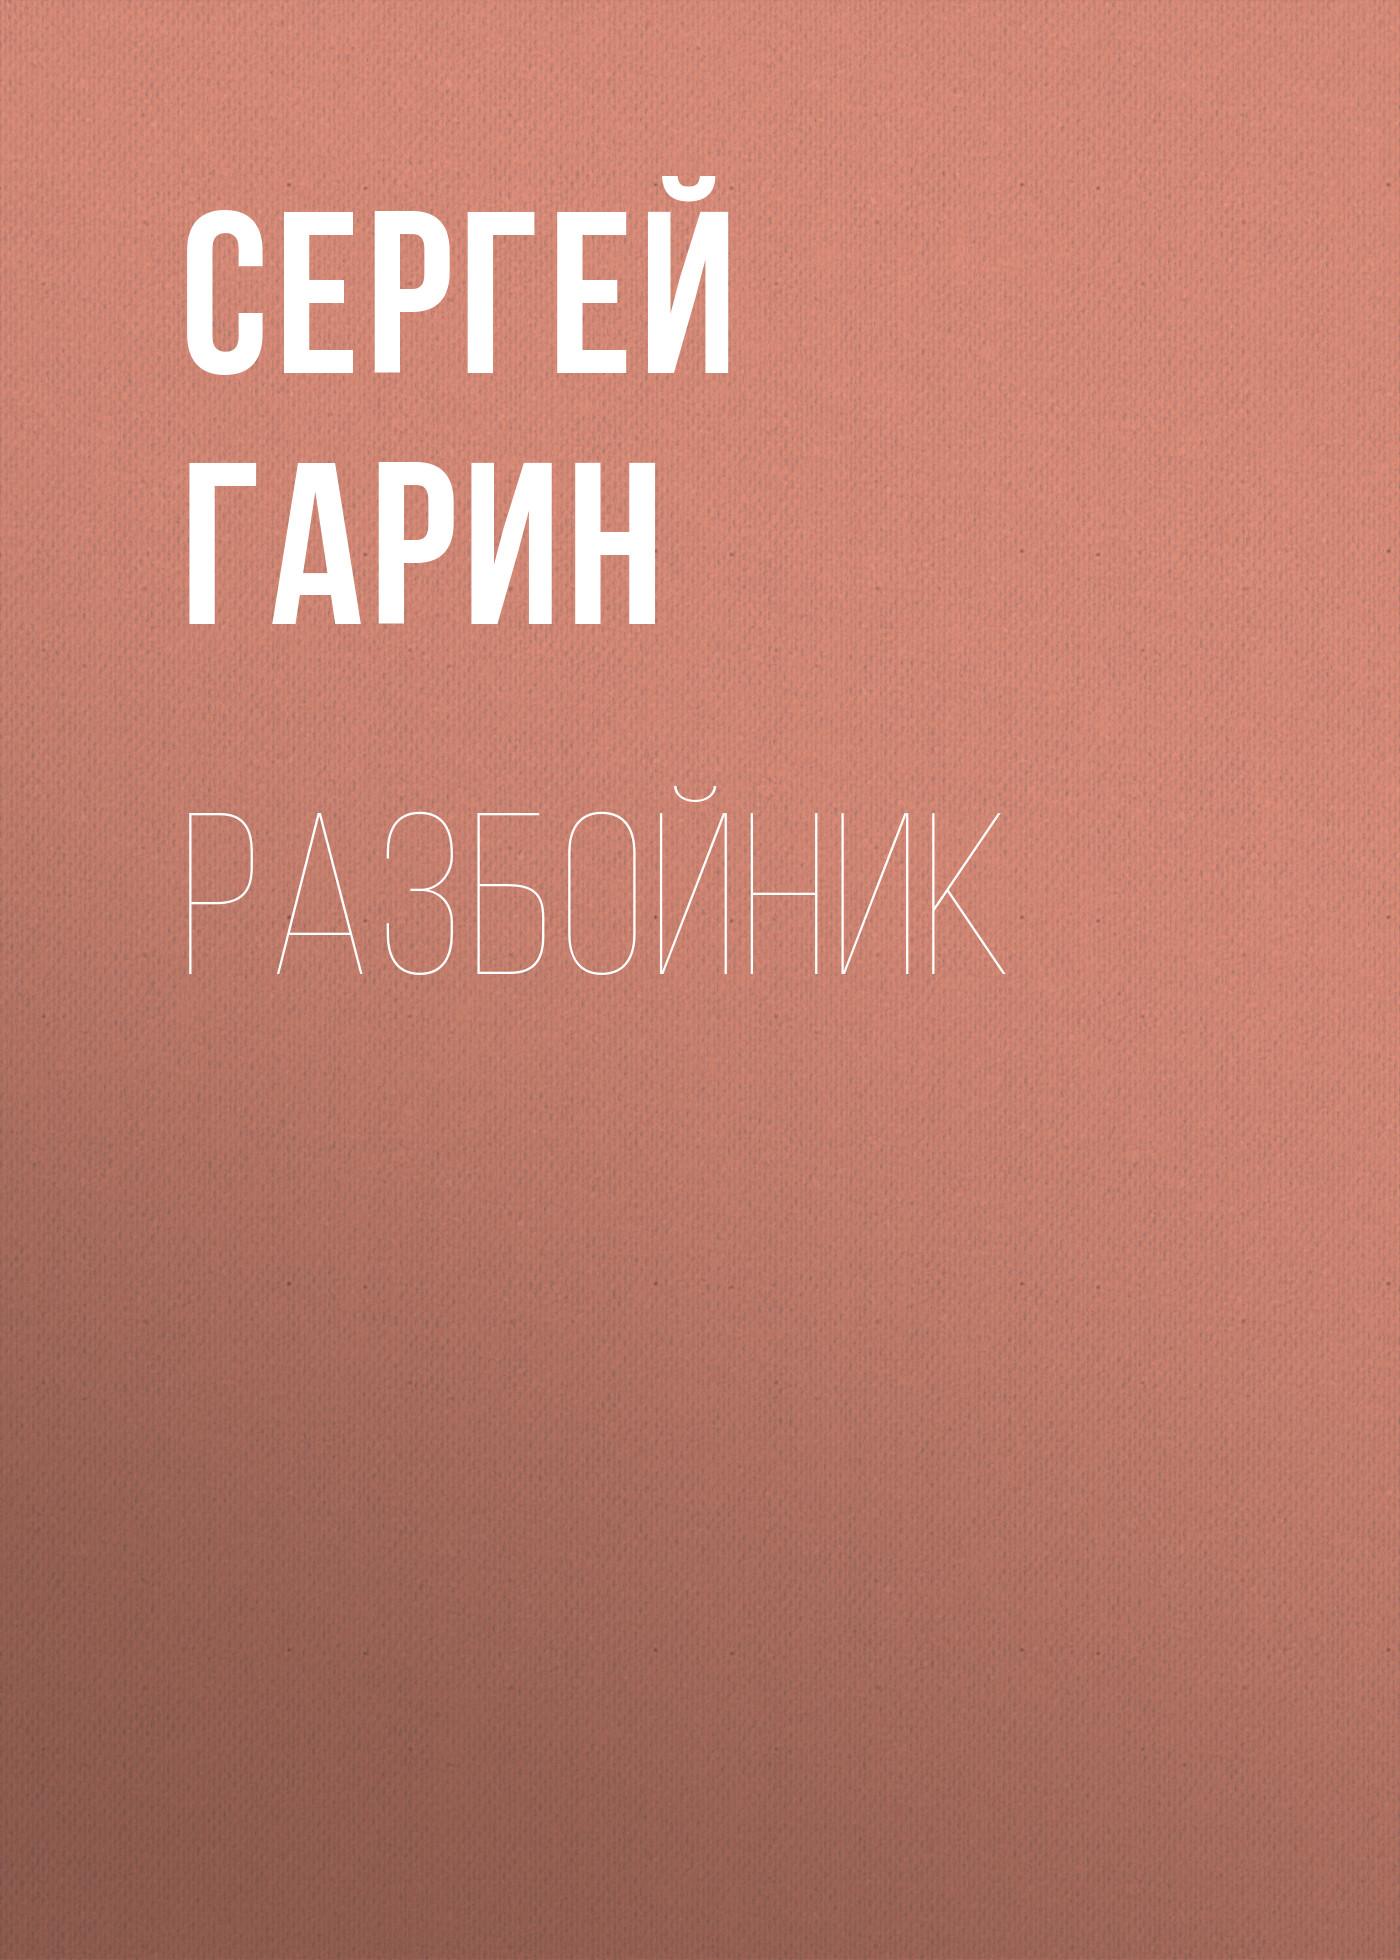 Сергей Гарин Разбойник